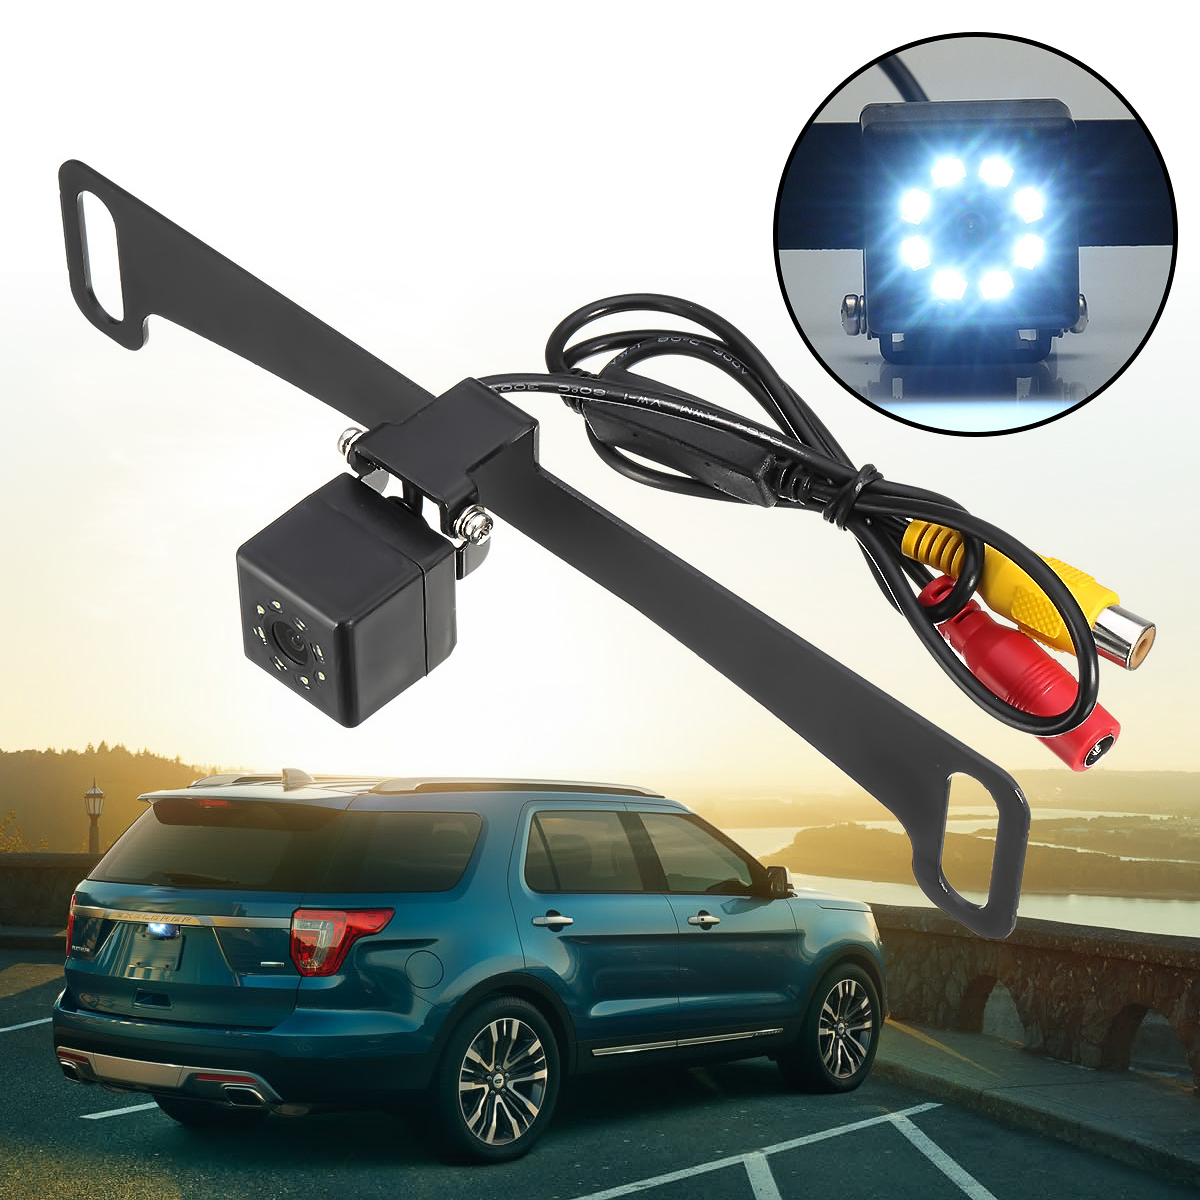 Buick LaCrosse: Rear Vision Camera (RVC)